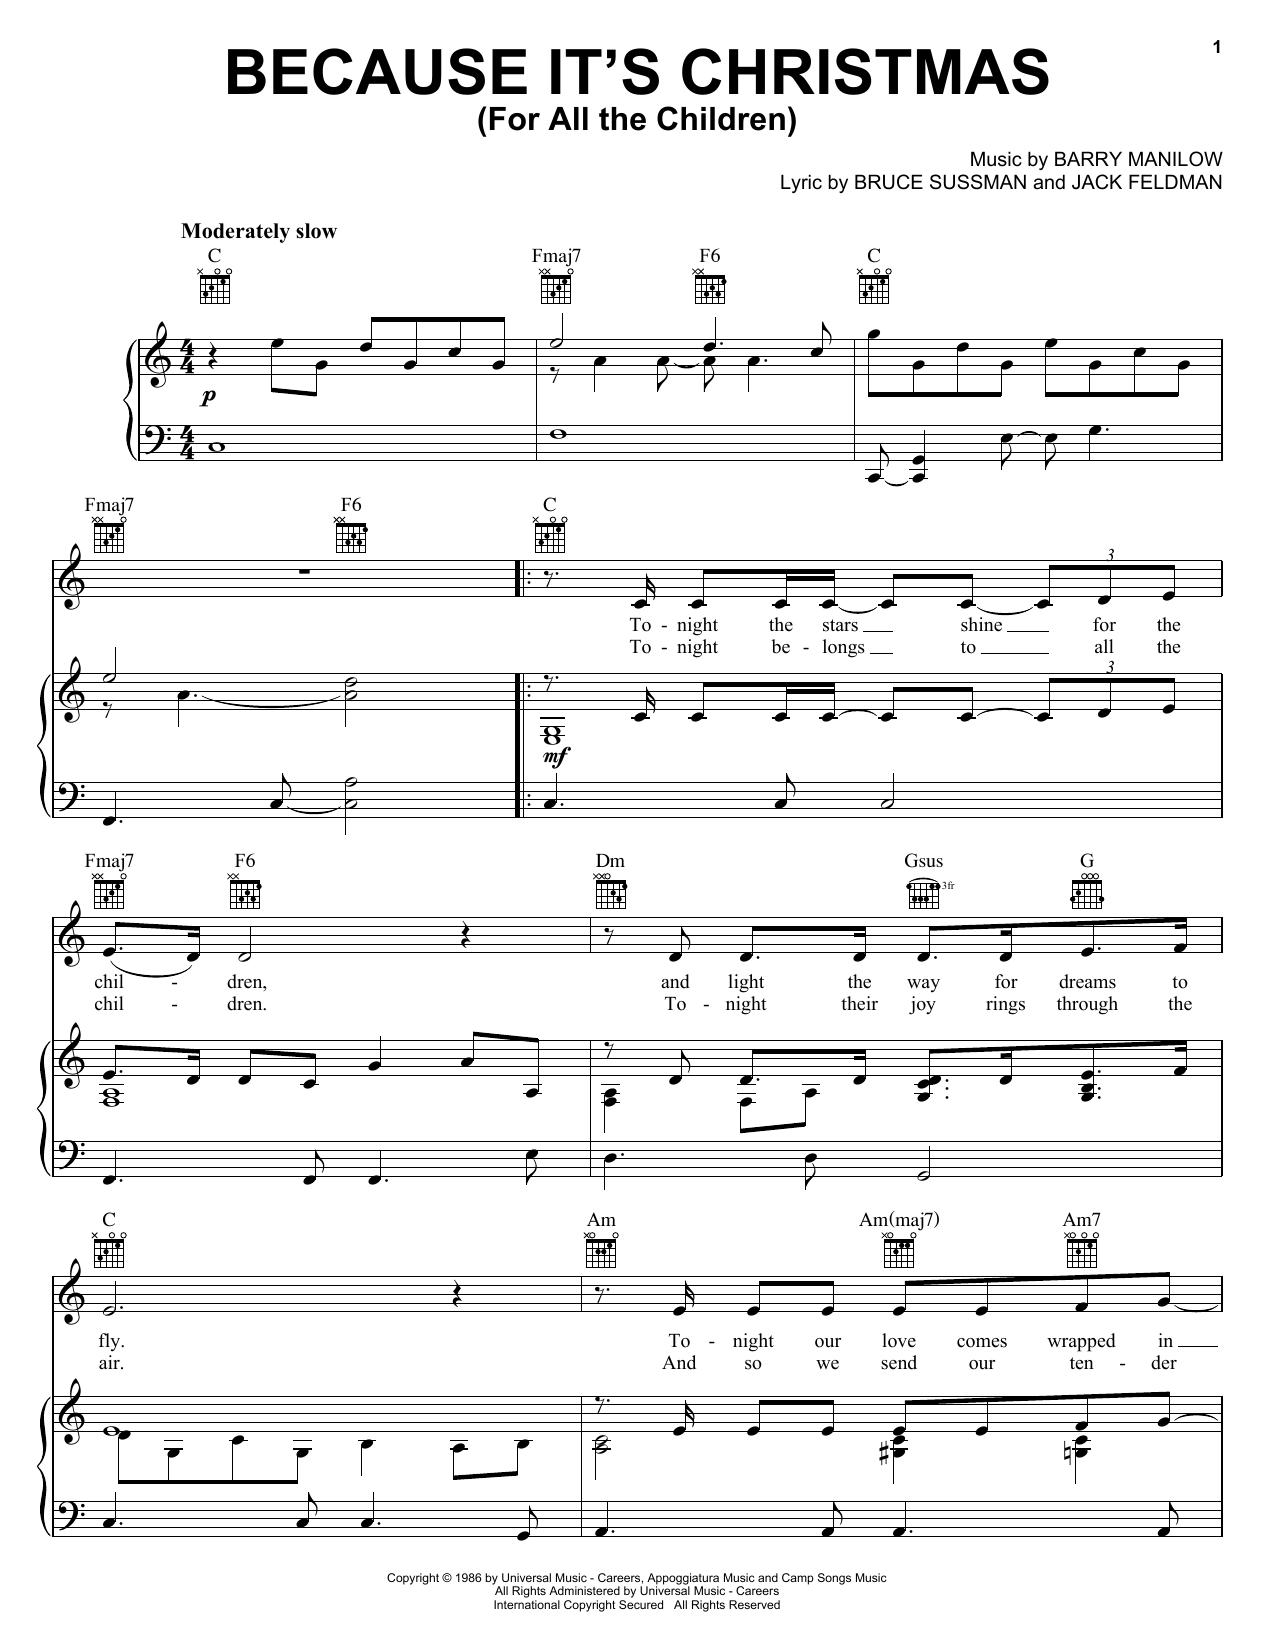 Home for the Holidays - 40 Christmas Favorites (P/V/G)) by No Composer